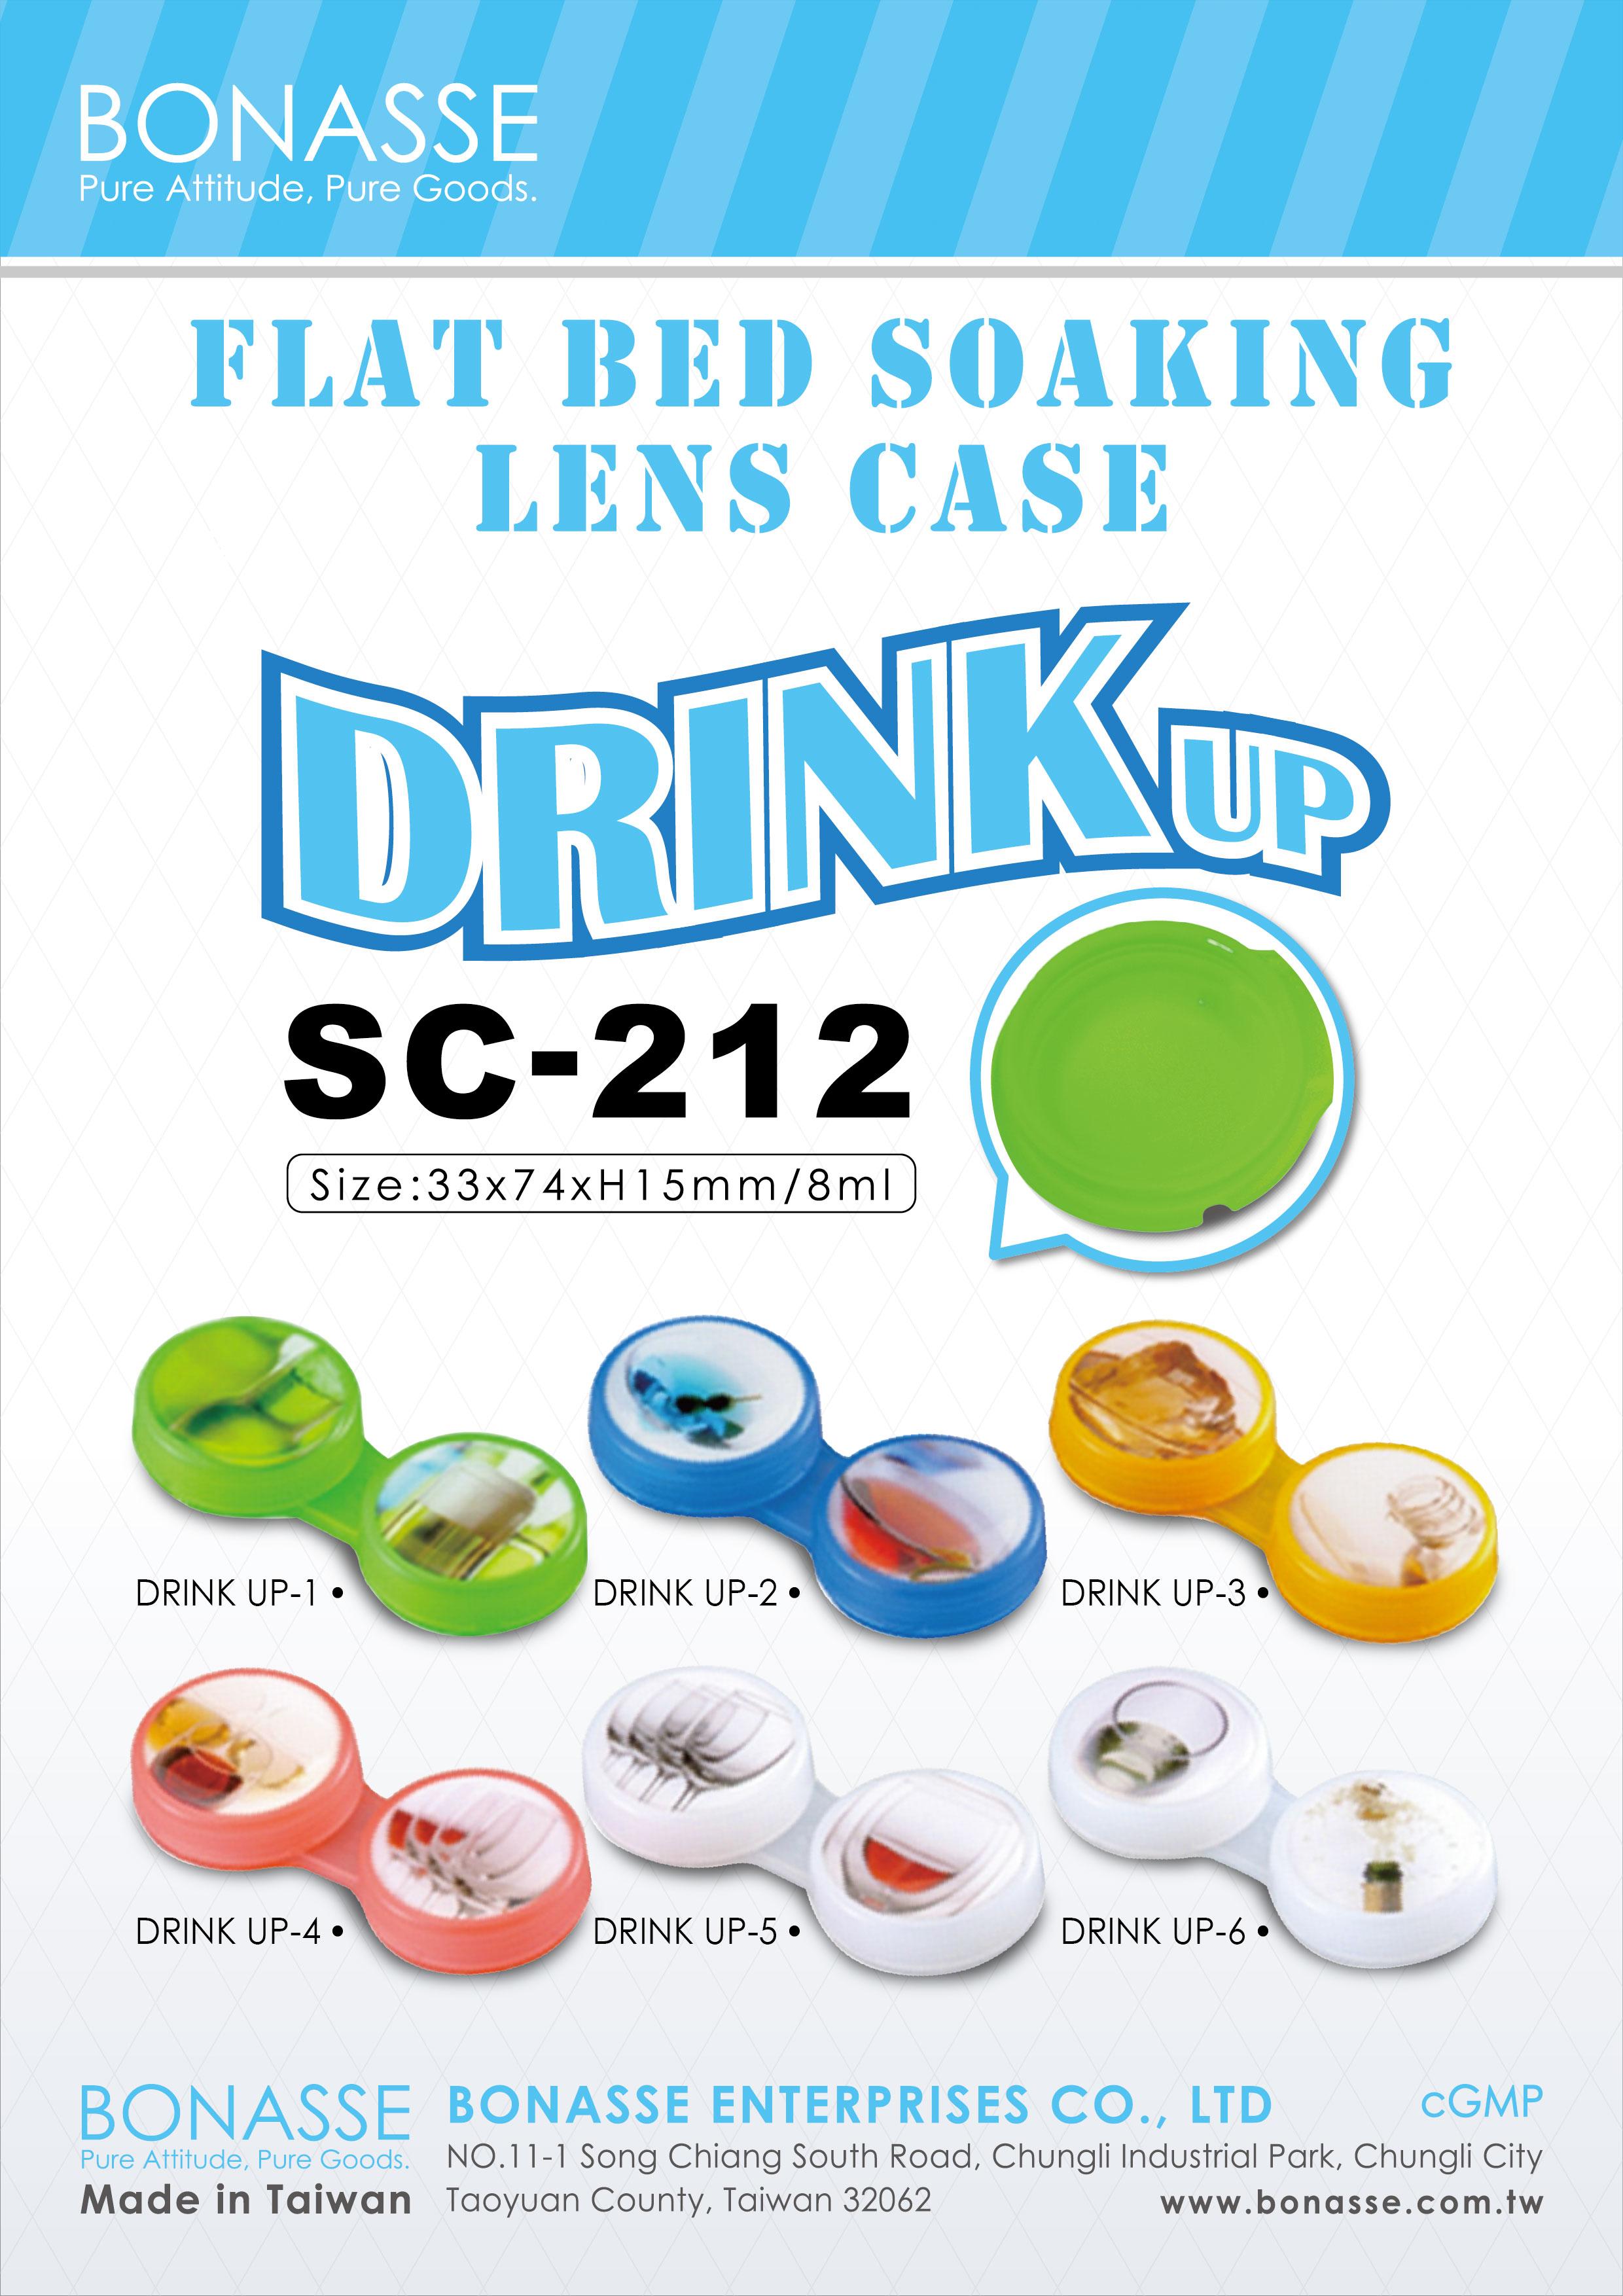 SC-212 DRINK UP